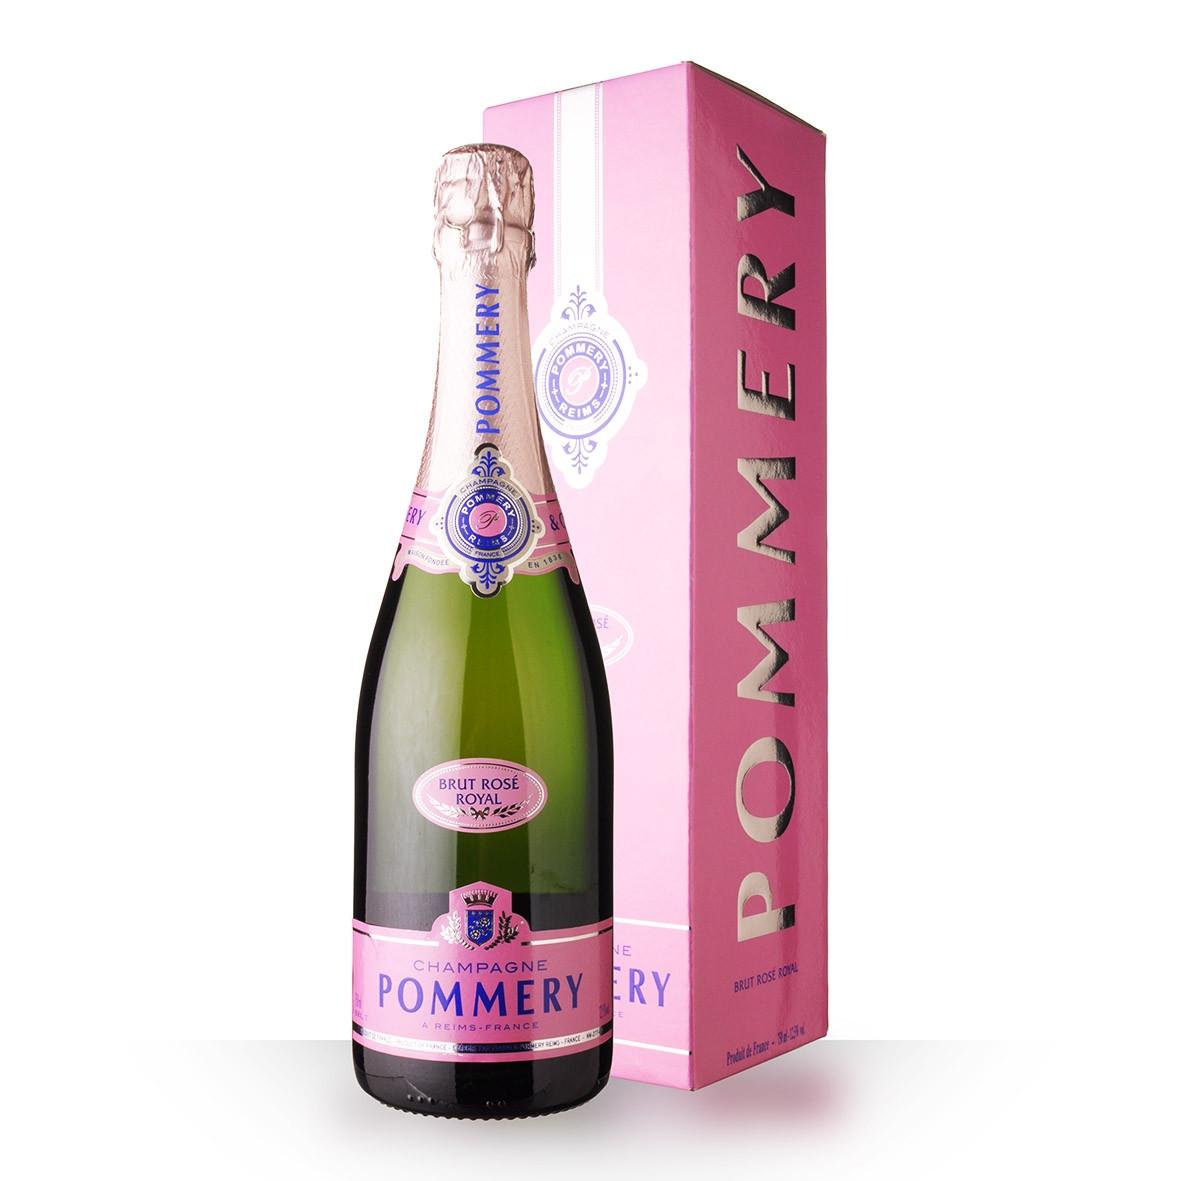 Champagne Pommery Brut Rosé 75cl Etui www.odyssee-vins.com